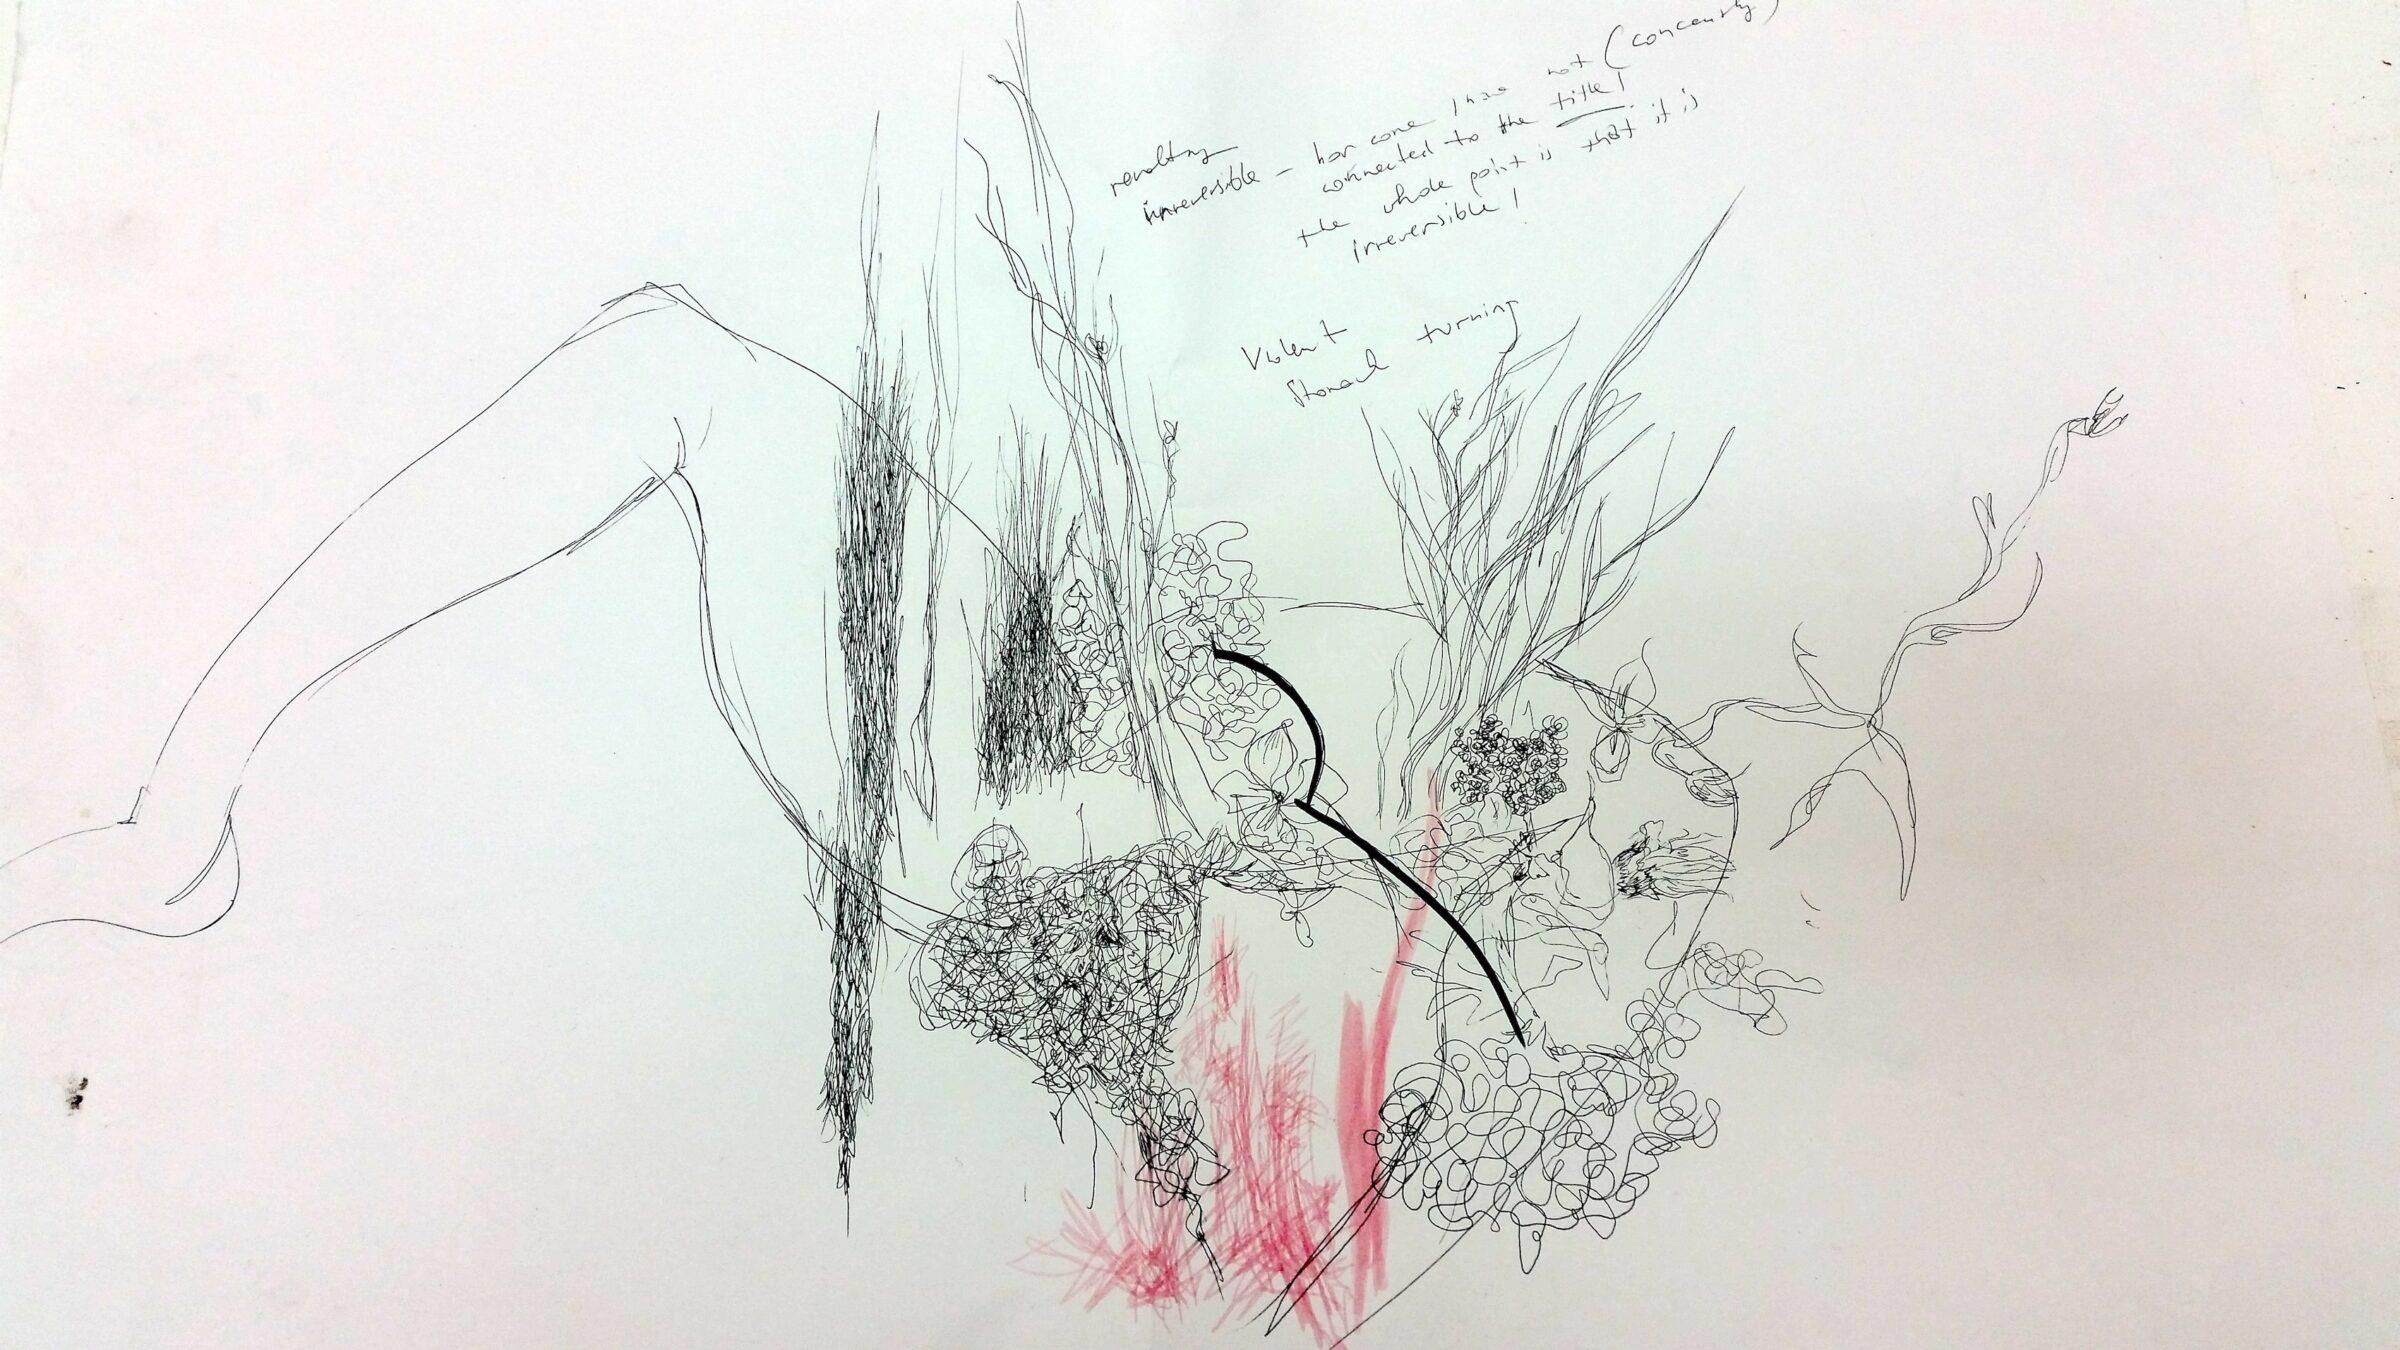 Relating III, 59 x 84cm, felt pen, marker, biro on paper, 2014.